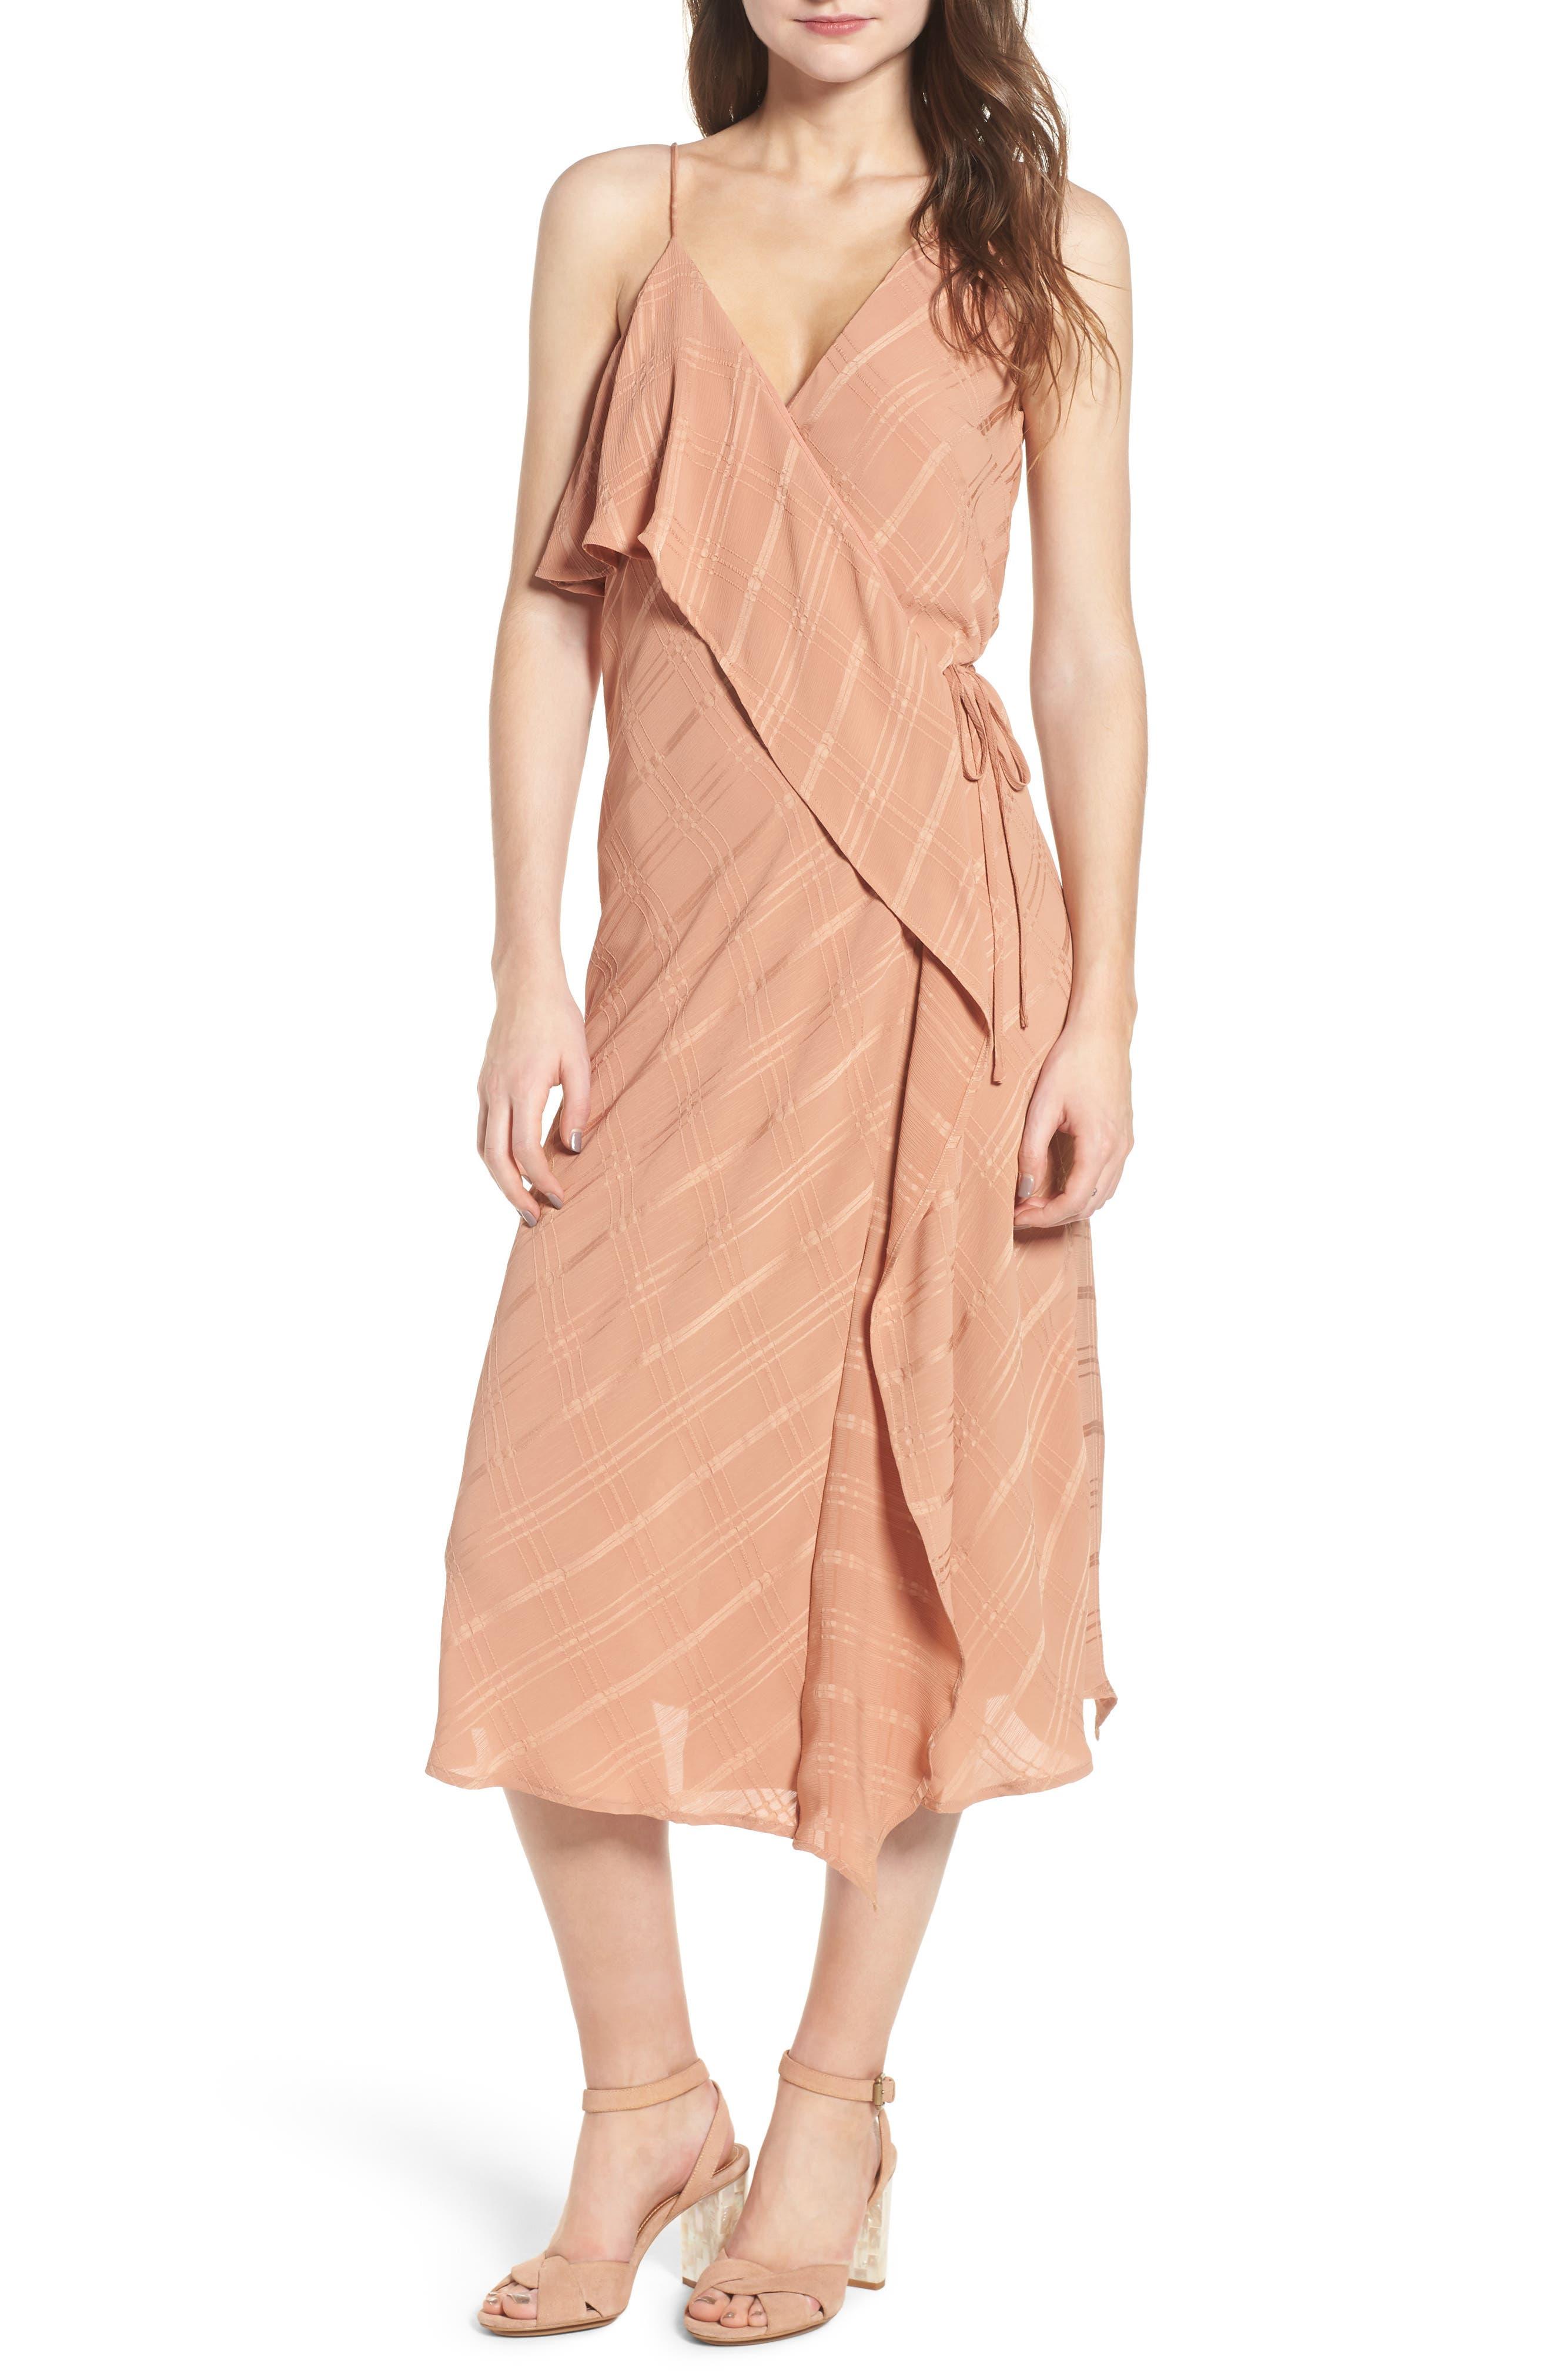 Yoanna Ruffle Trim Wrap Dress,                         Main,                         color, Terracotta